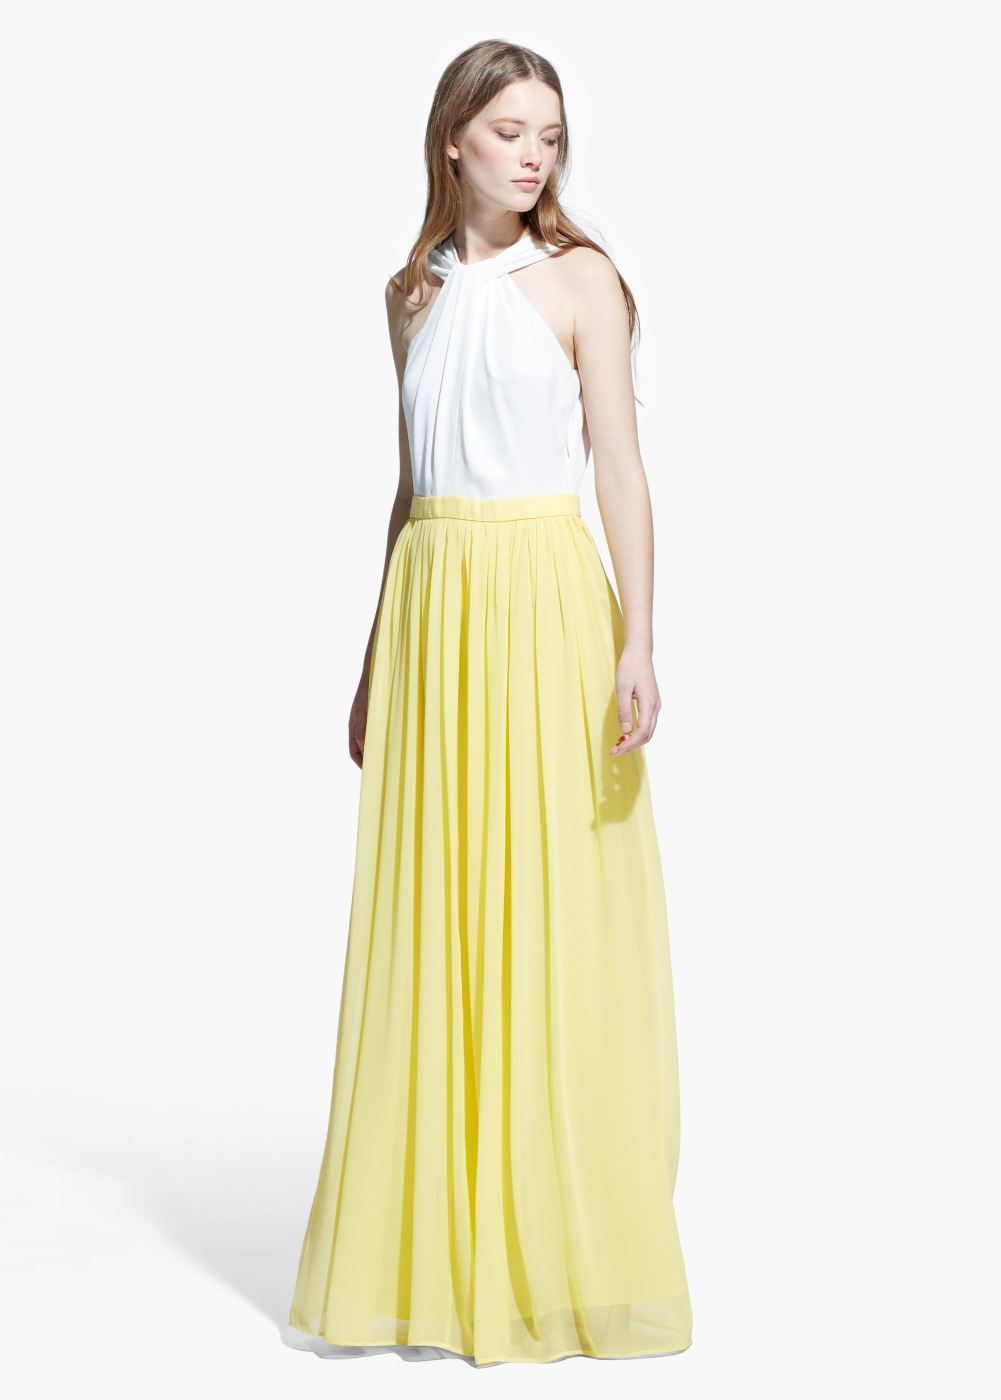 Robe Mango Bicolore 99,99 Euros